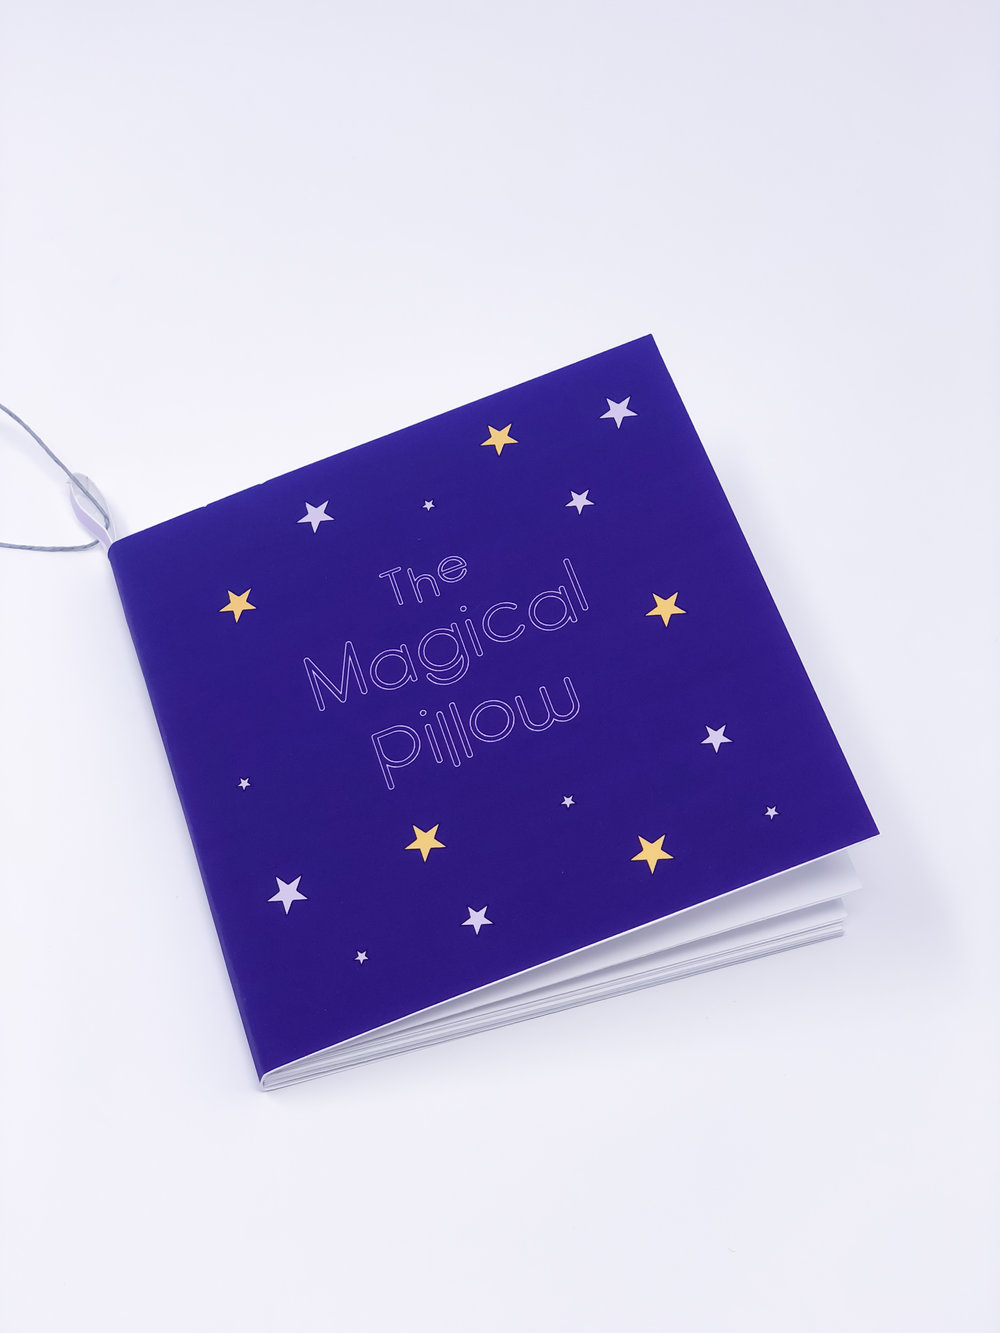 magical pillow cover .jpg